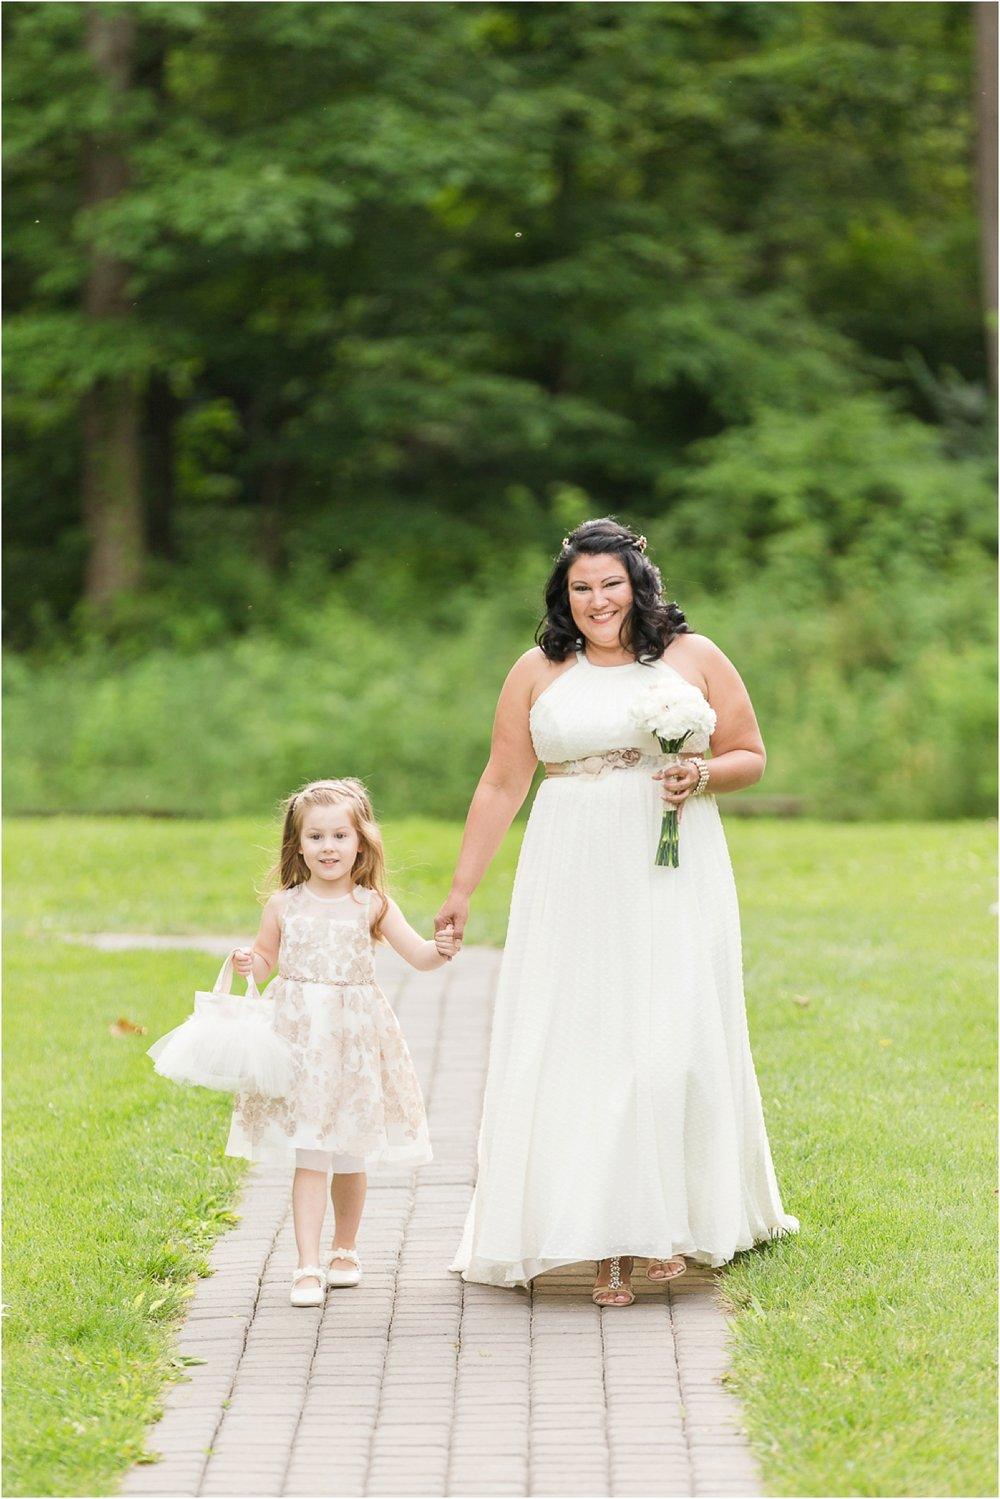 Gettysburg-Lodges-Wedding-142.jpg